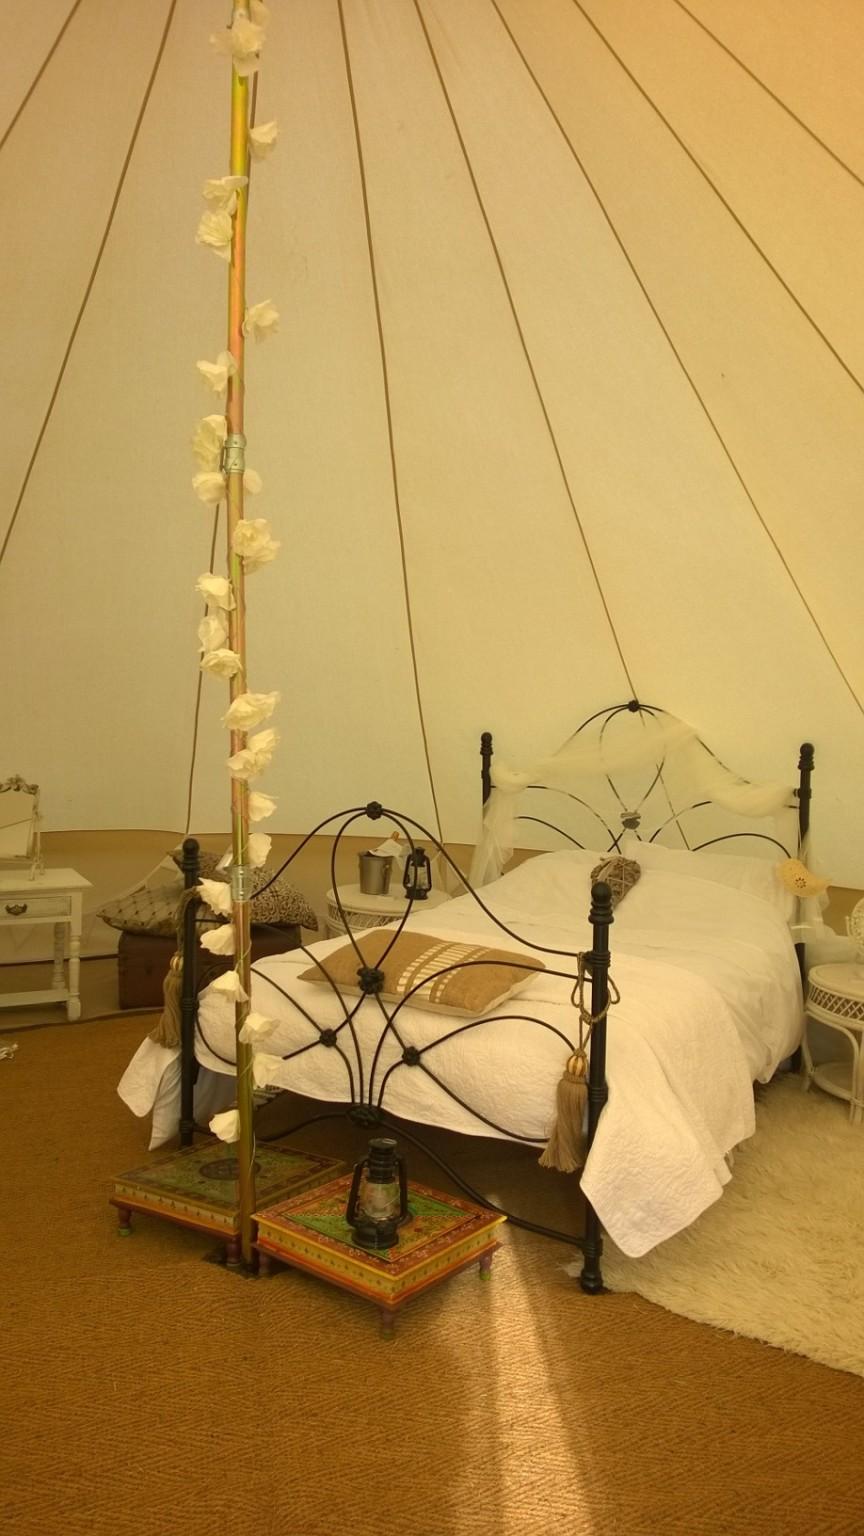 Luxury interior, wedding tent